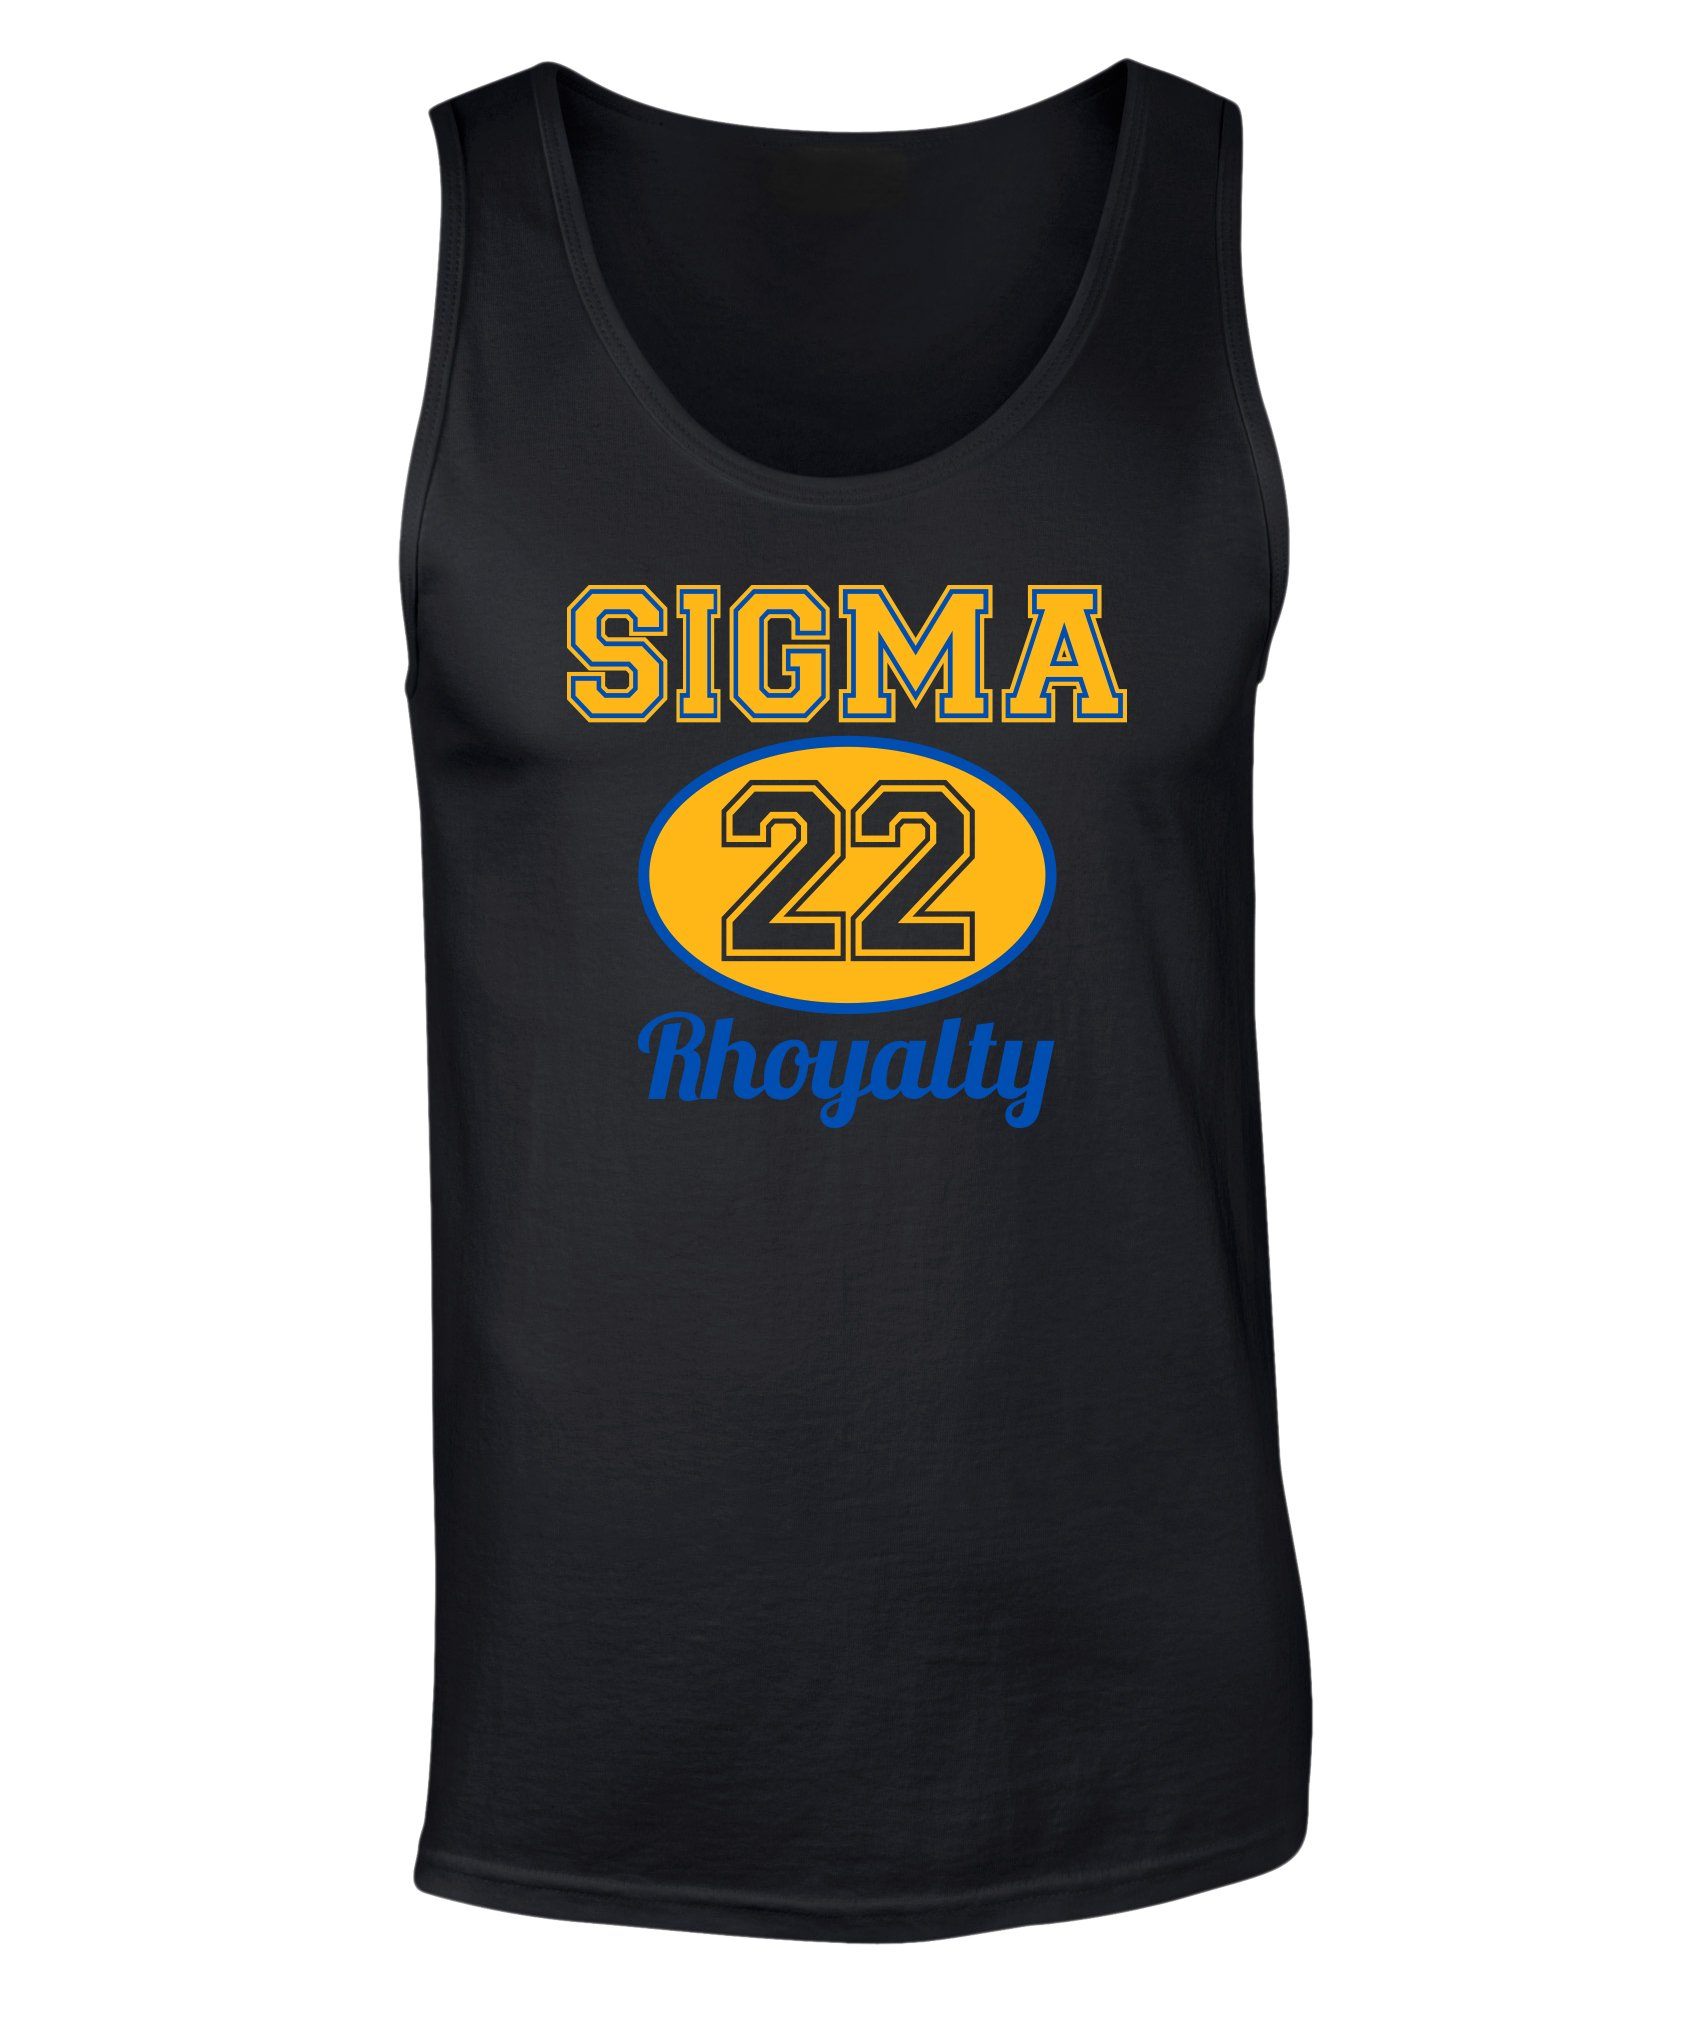 Sigma Gamma Rho Sigma Athletics Graphic Print Tank Top 8610 Shirts